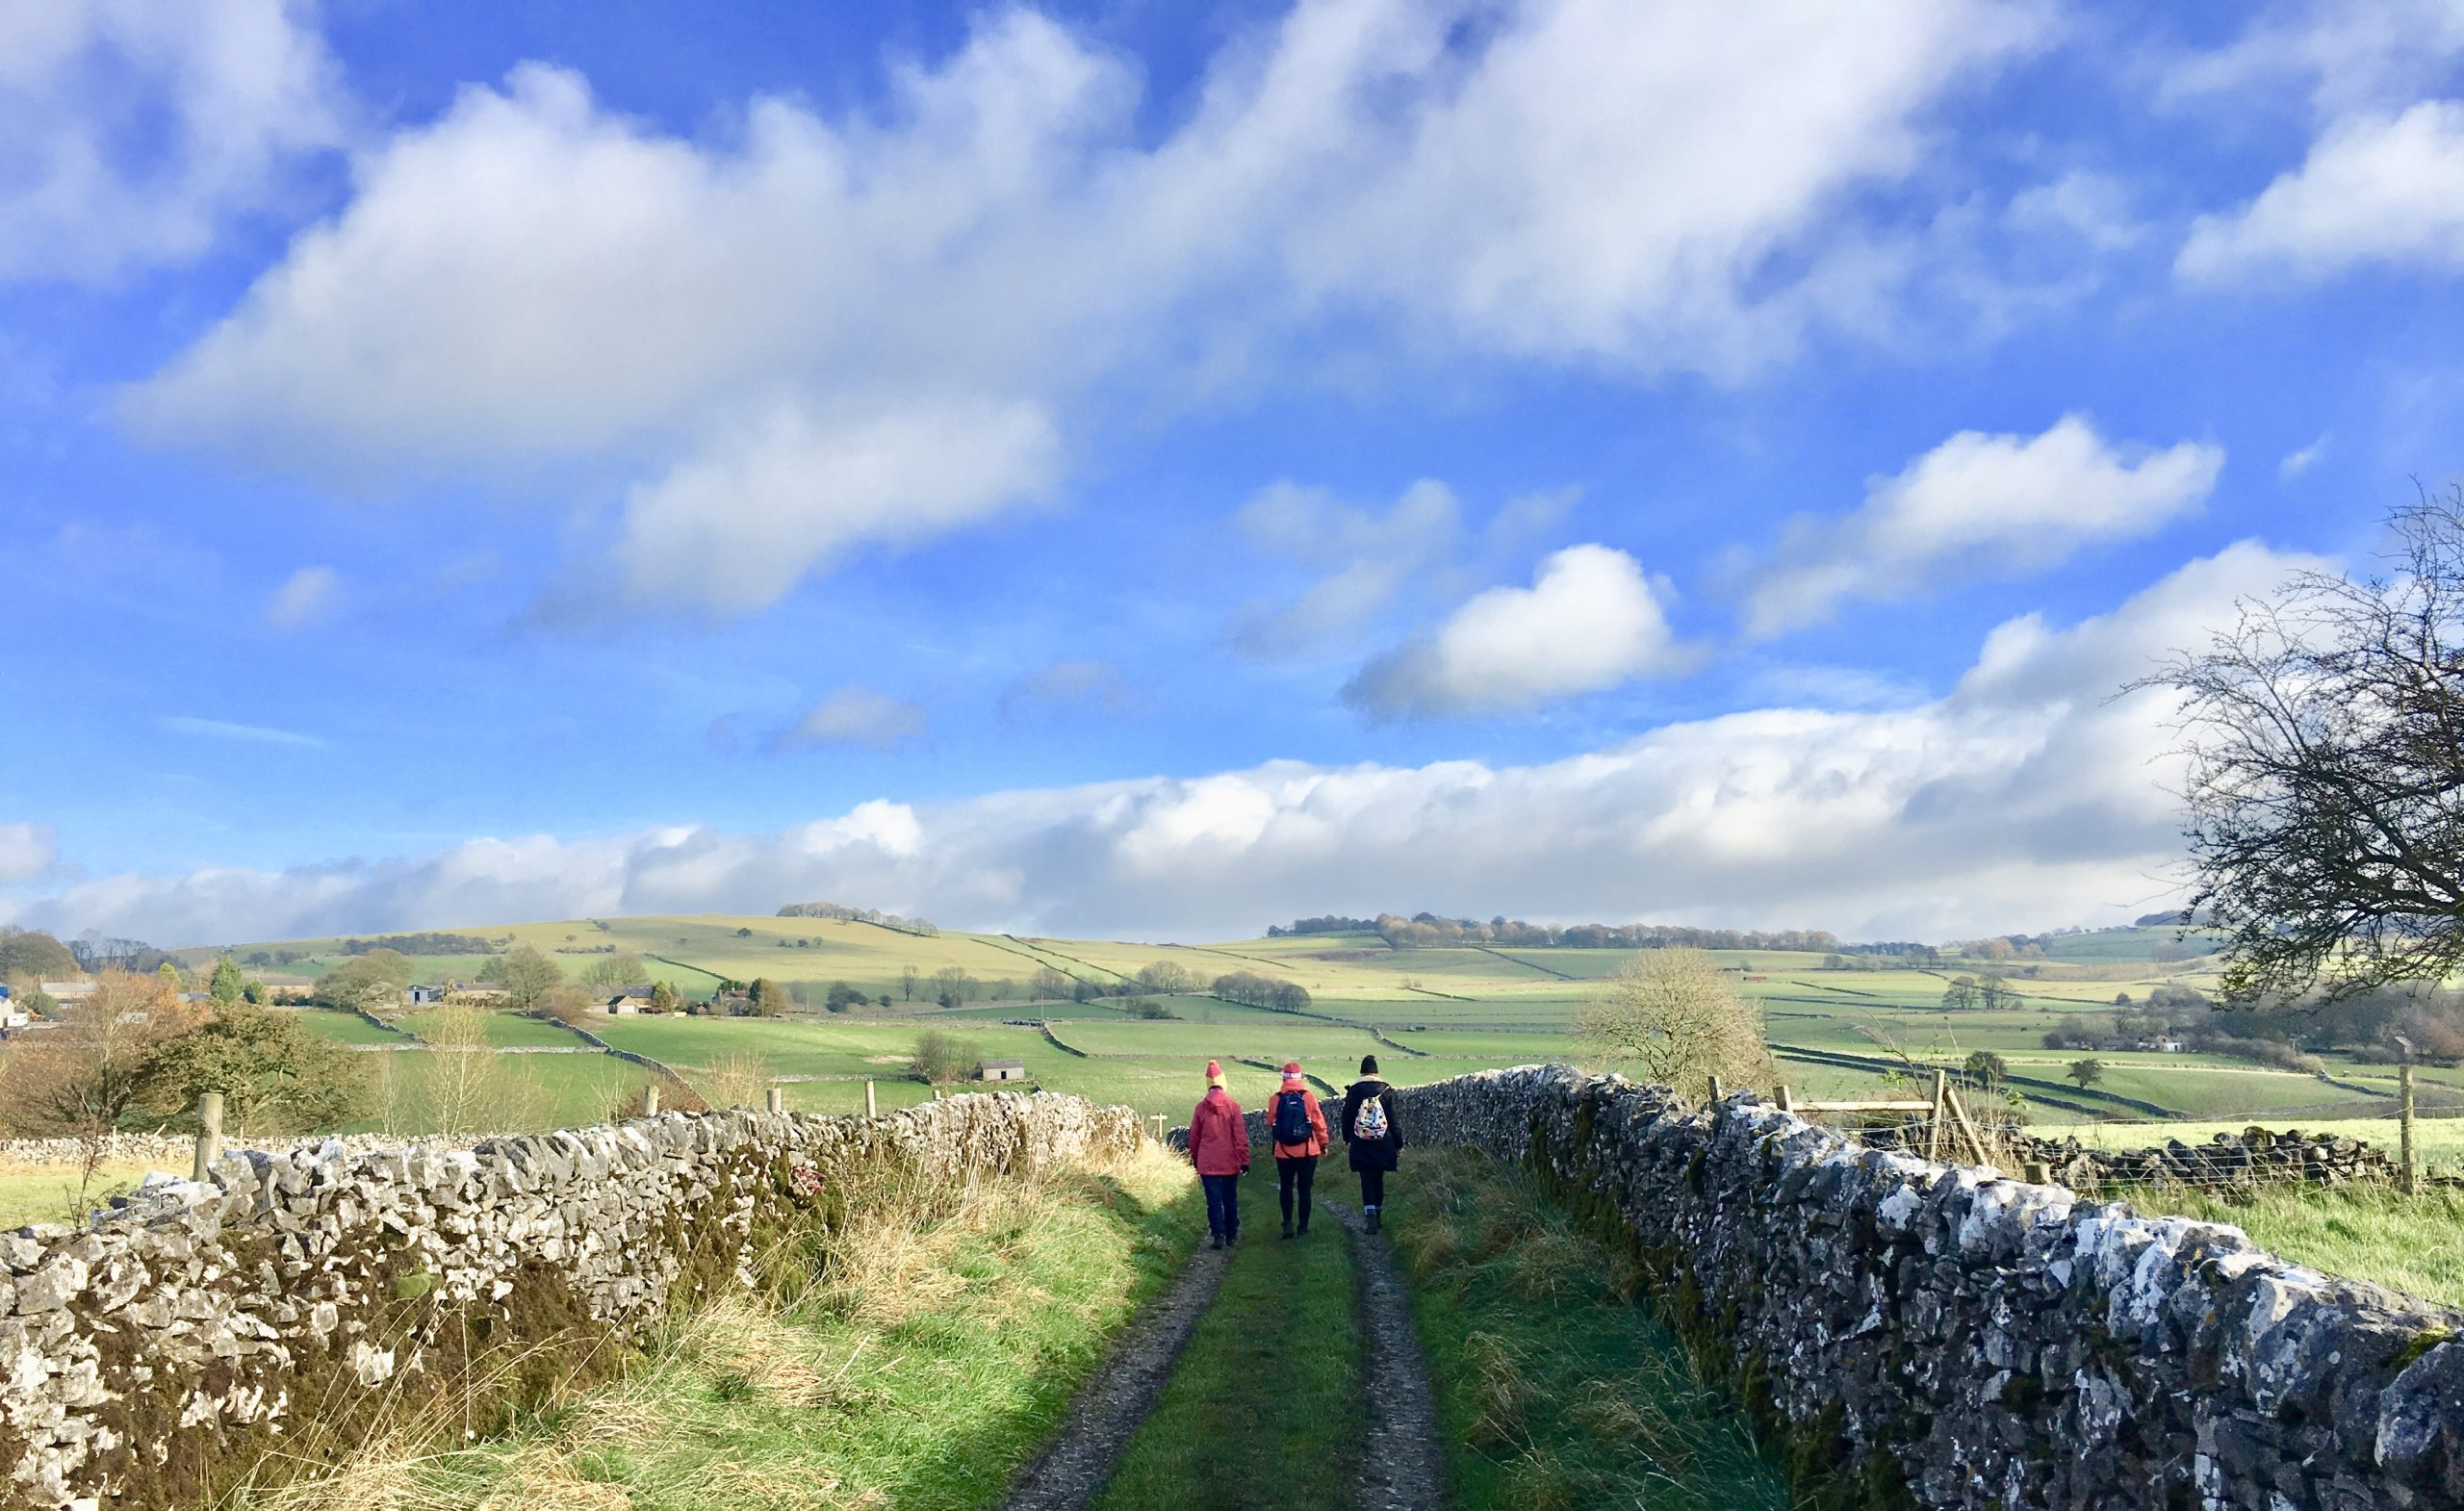 Stroll around the Hartington area in Derbyshire